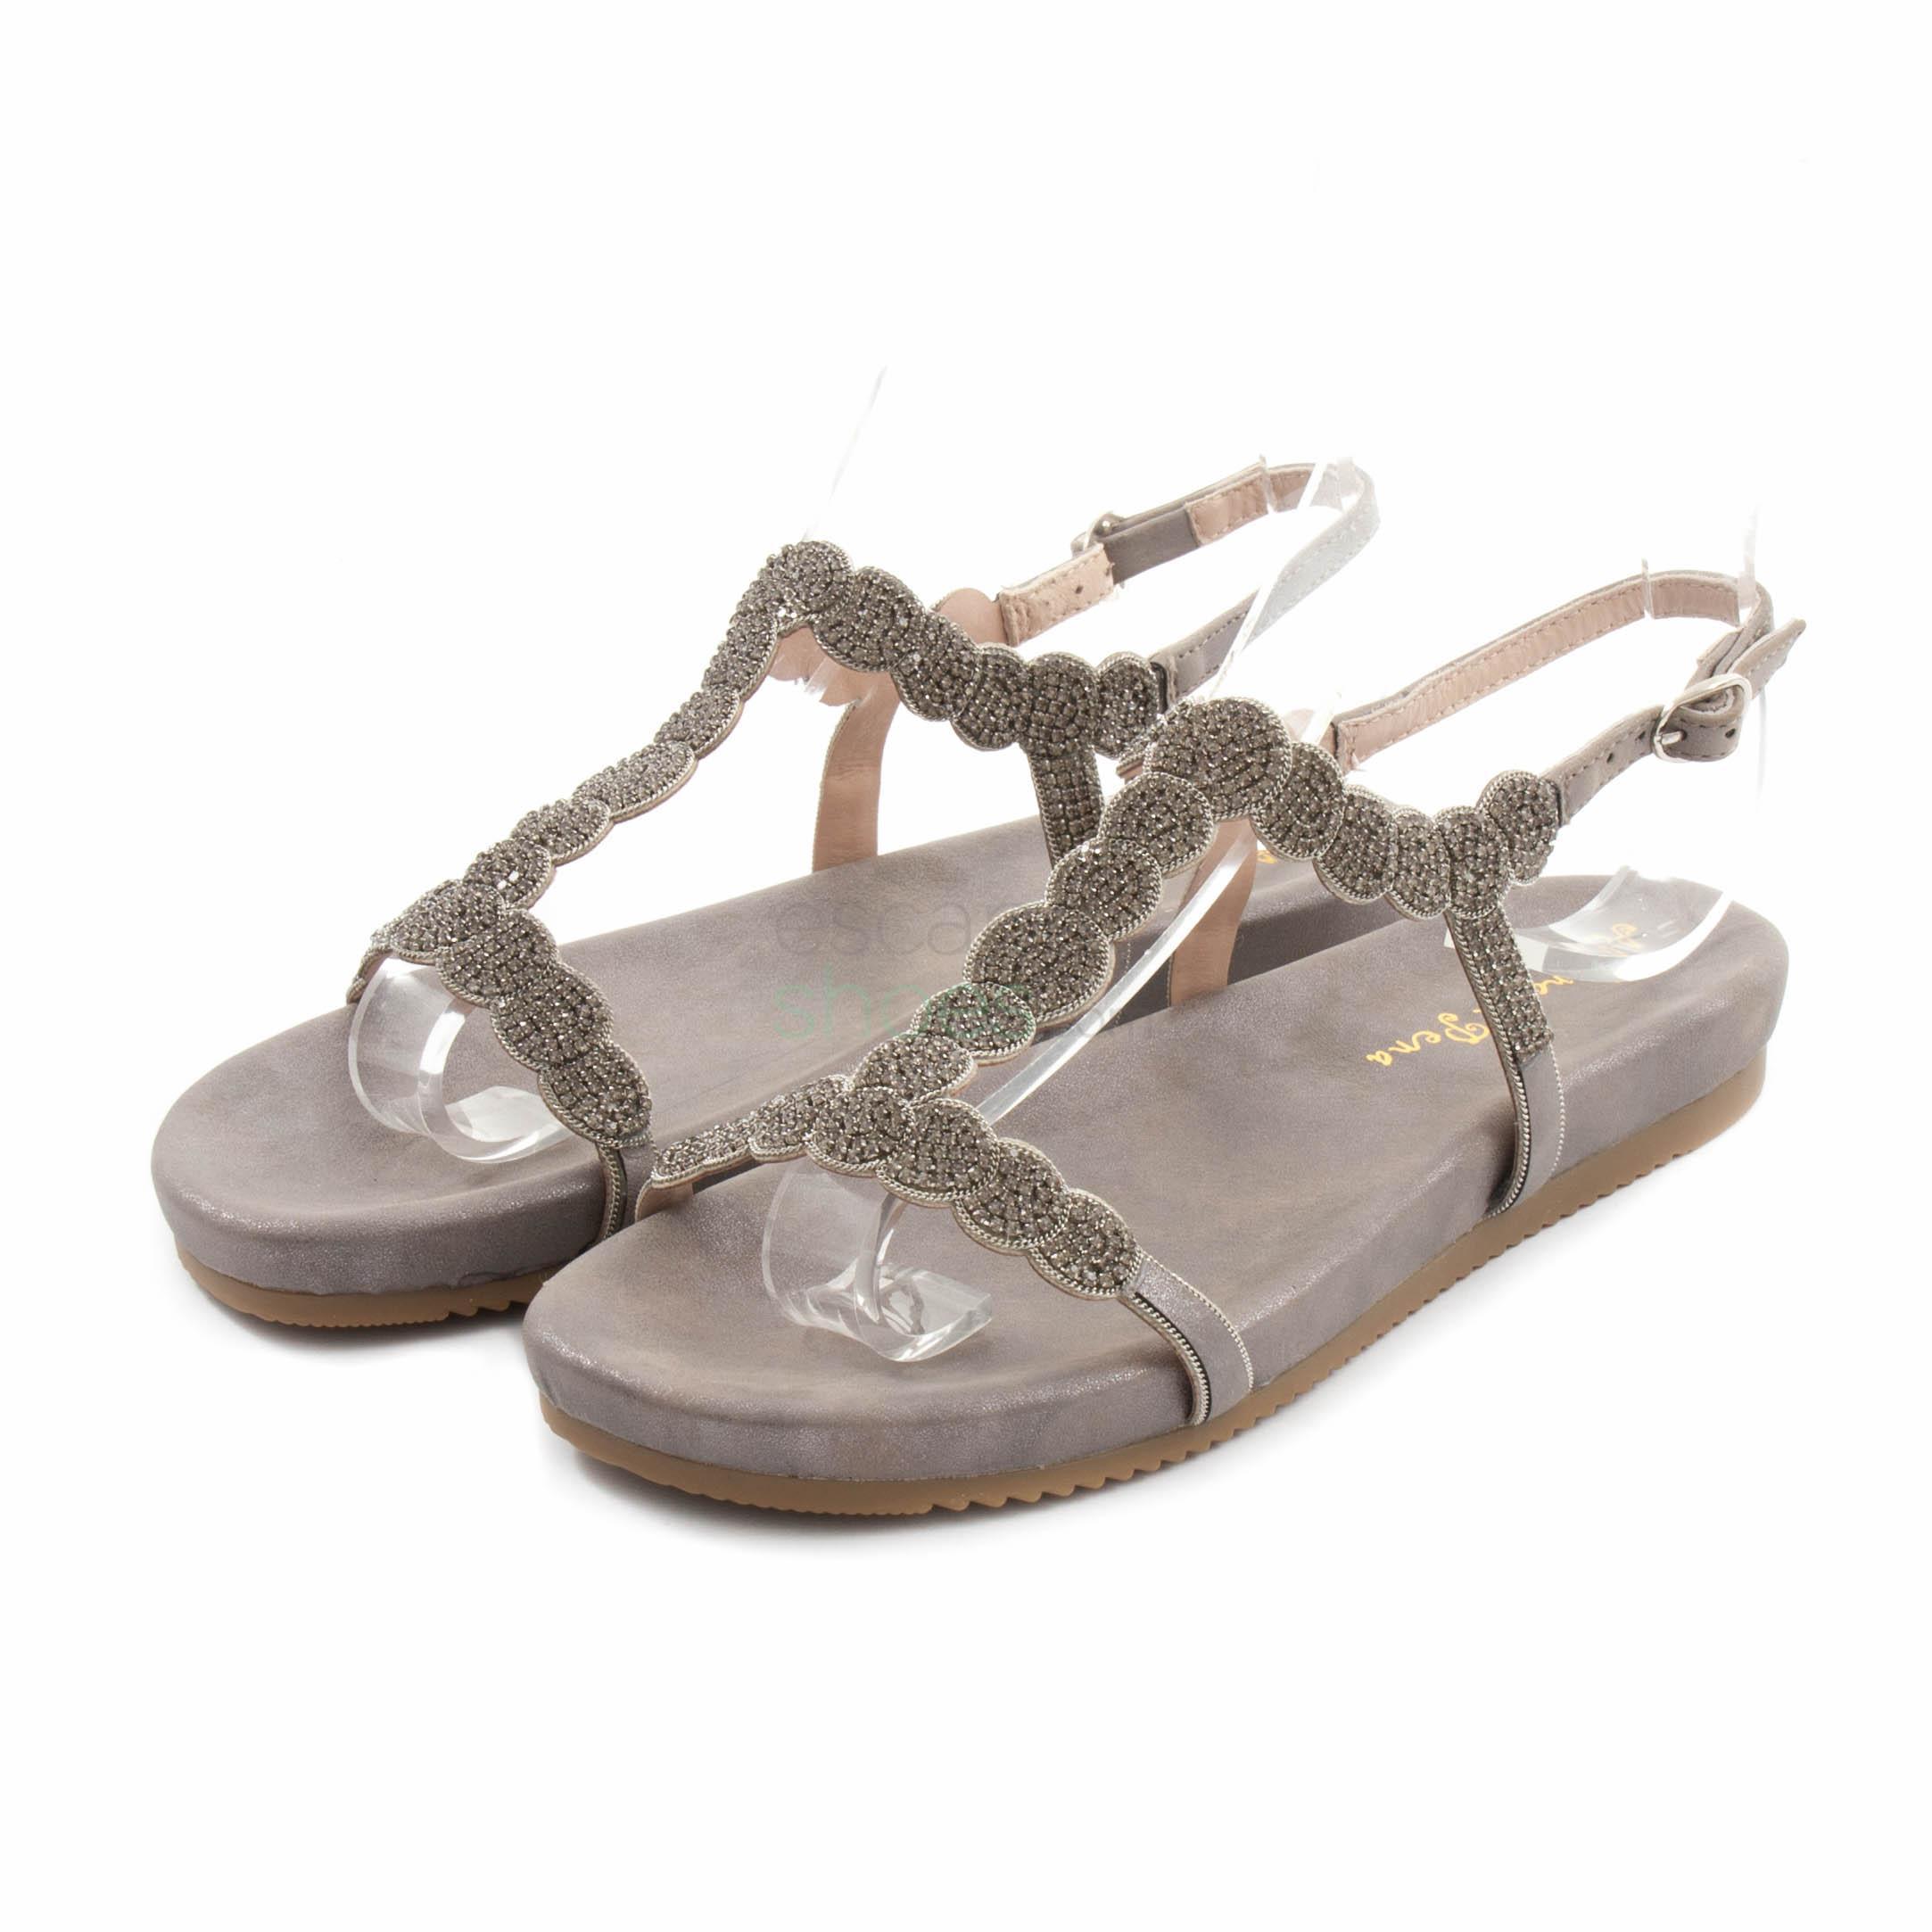 c42a5c340dc Buy your Sandals ALMA EN PENA V18454 Oporto Pewter here | Online ...